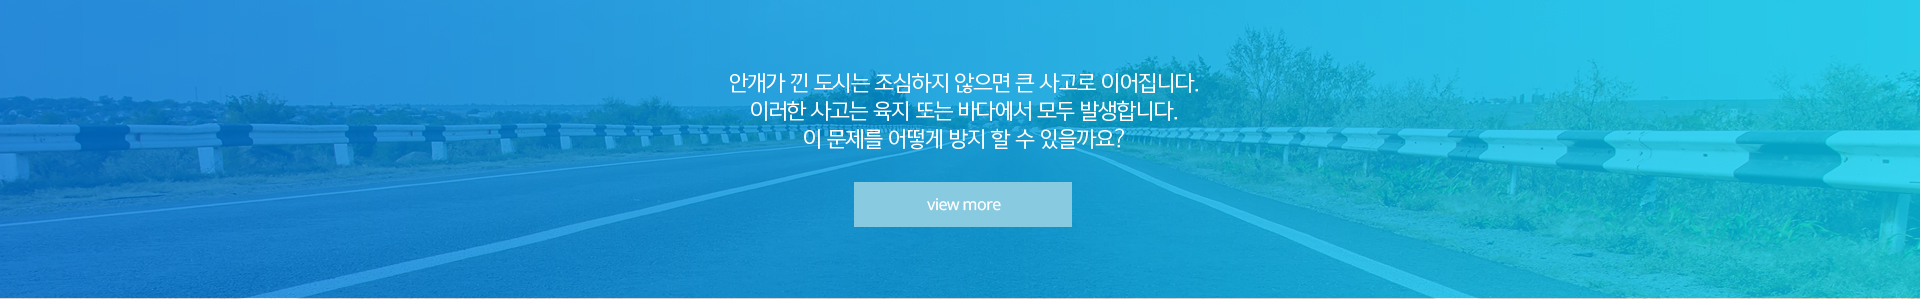 go_to_sijung